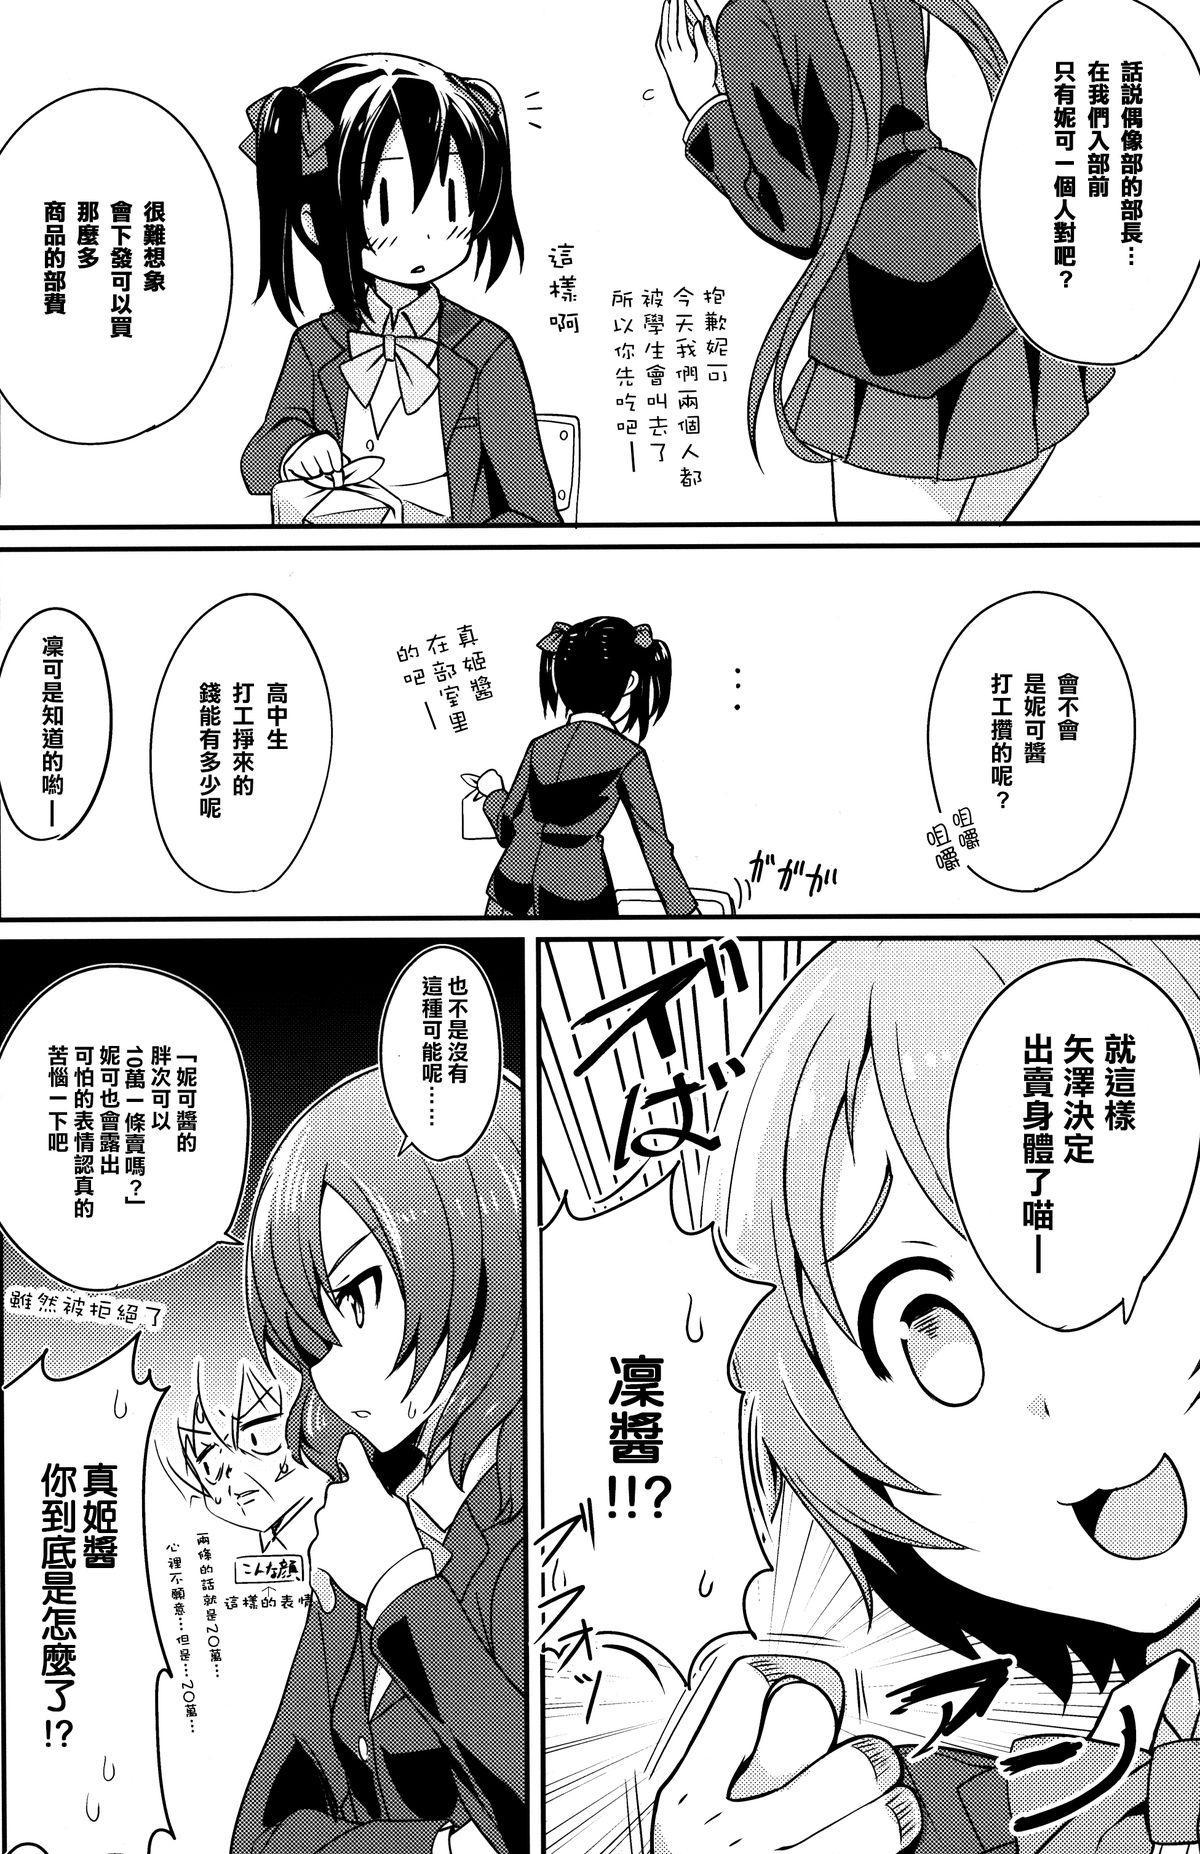 Nico-chan Eroi 4